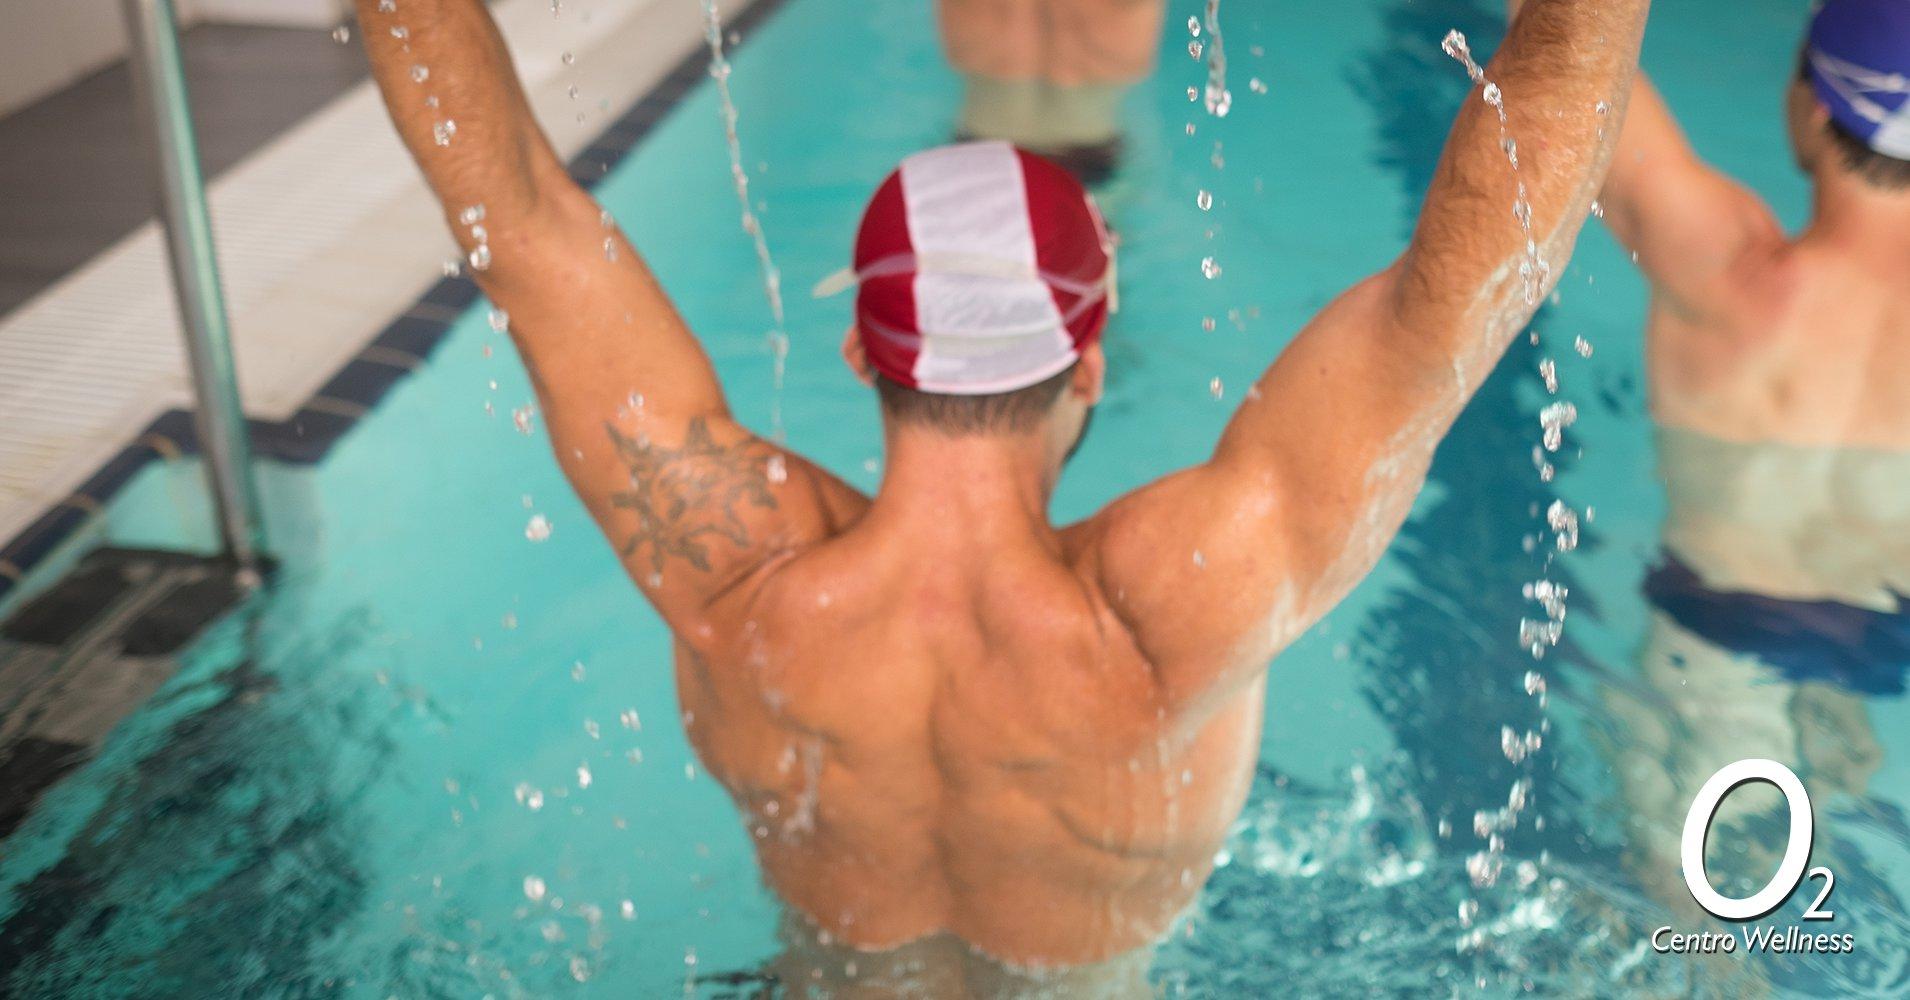 Piscina Natacion mejora tu tecnica de nado en o2cw